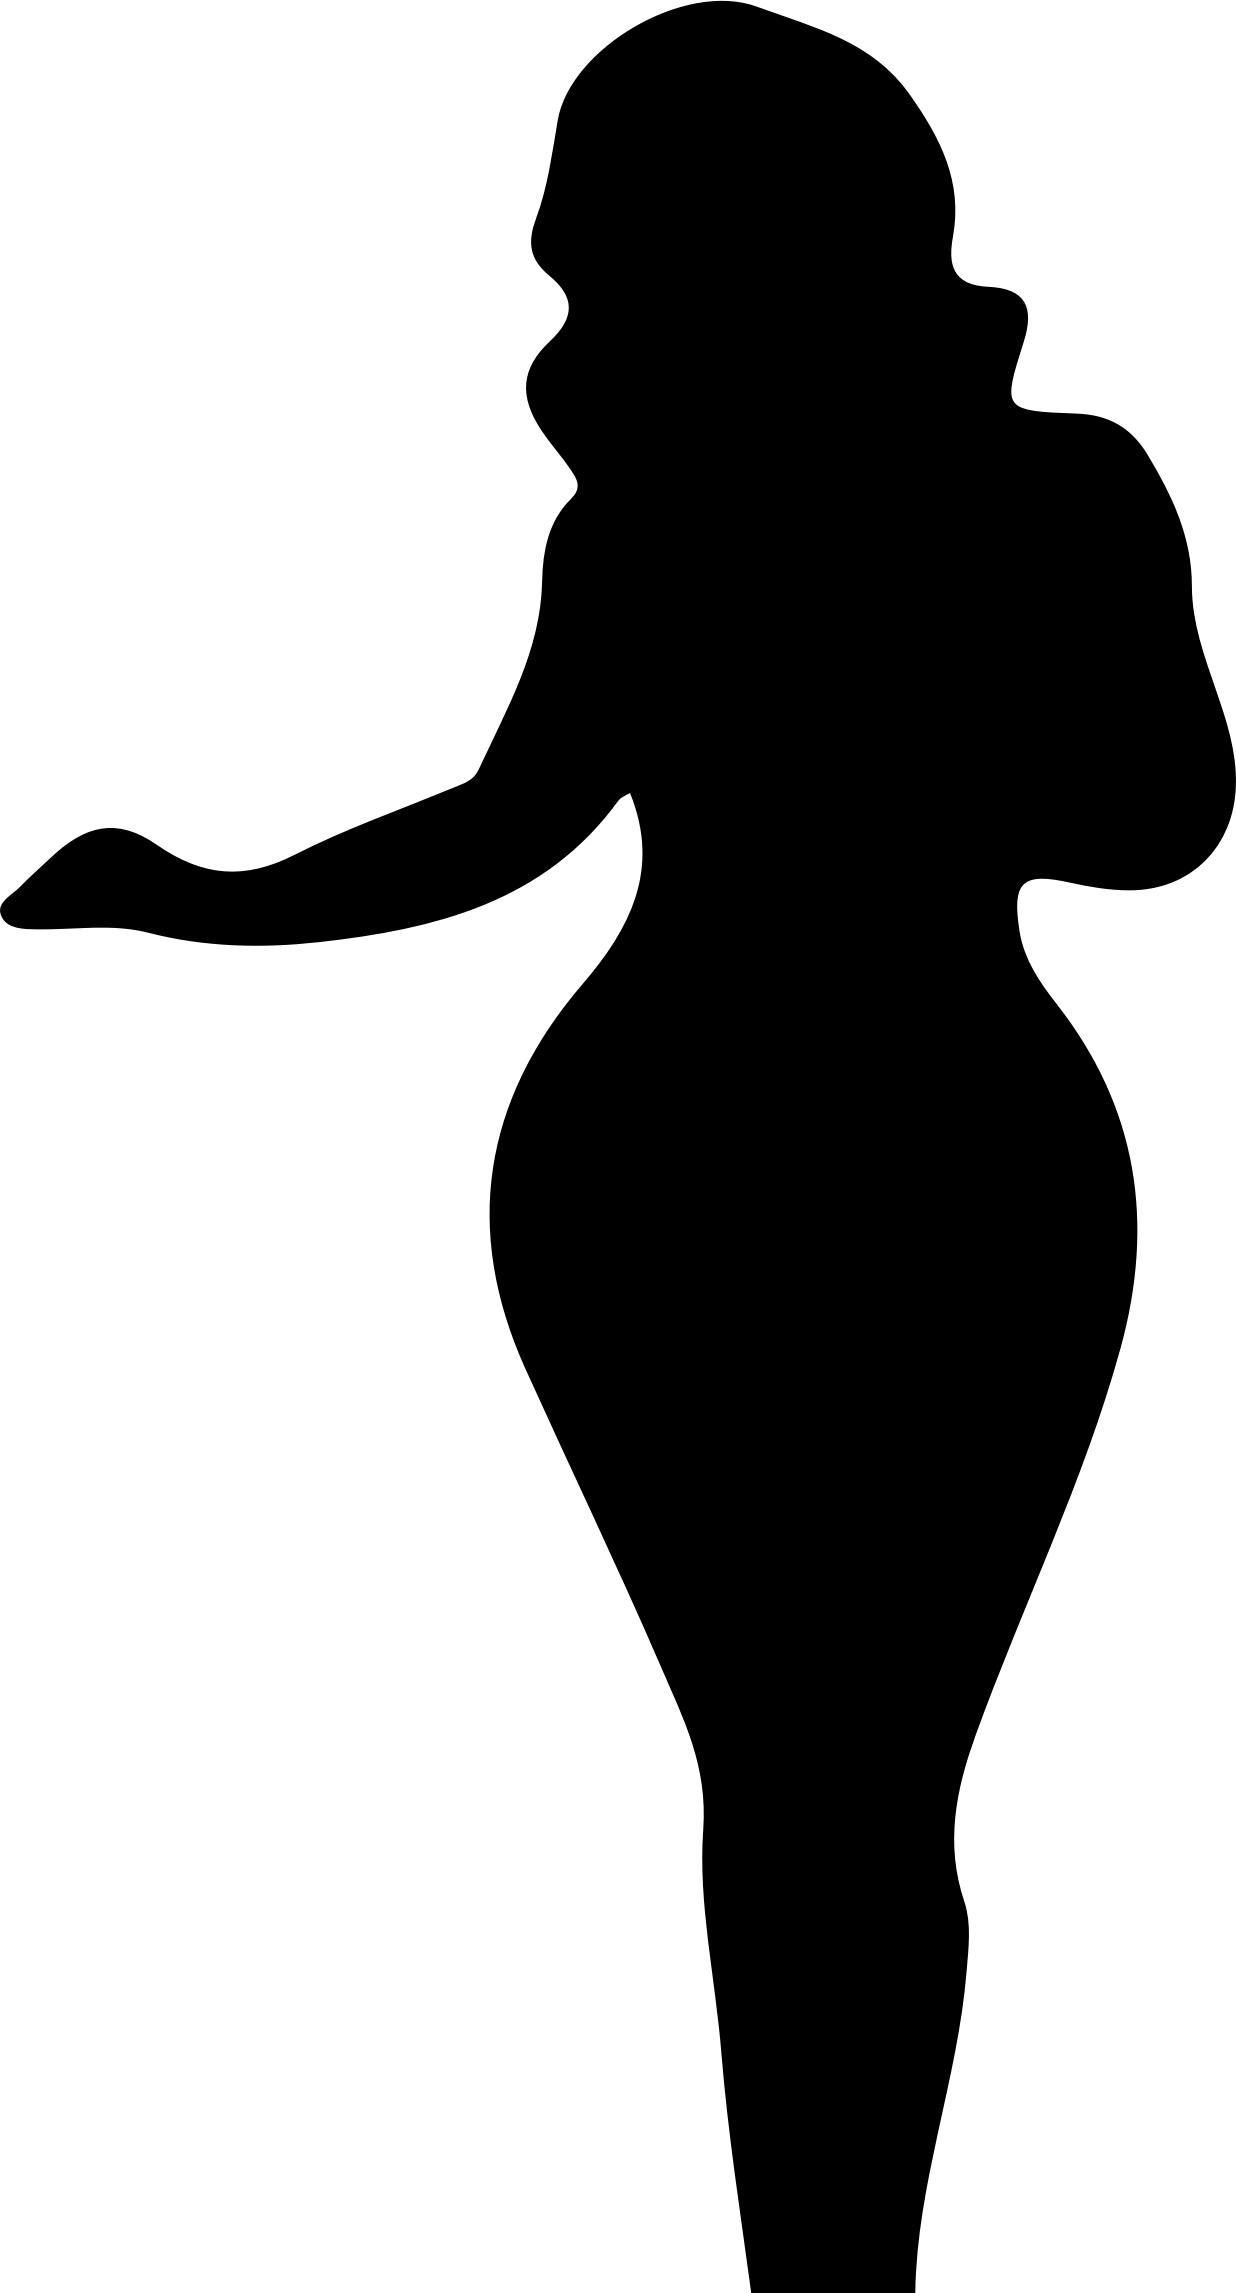 Full Figured Woman Silhouette In 2021 Black Woman Silhouette Woman Silhouette Silhouette Clip Art